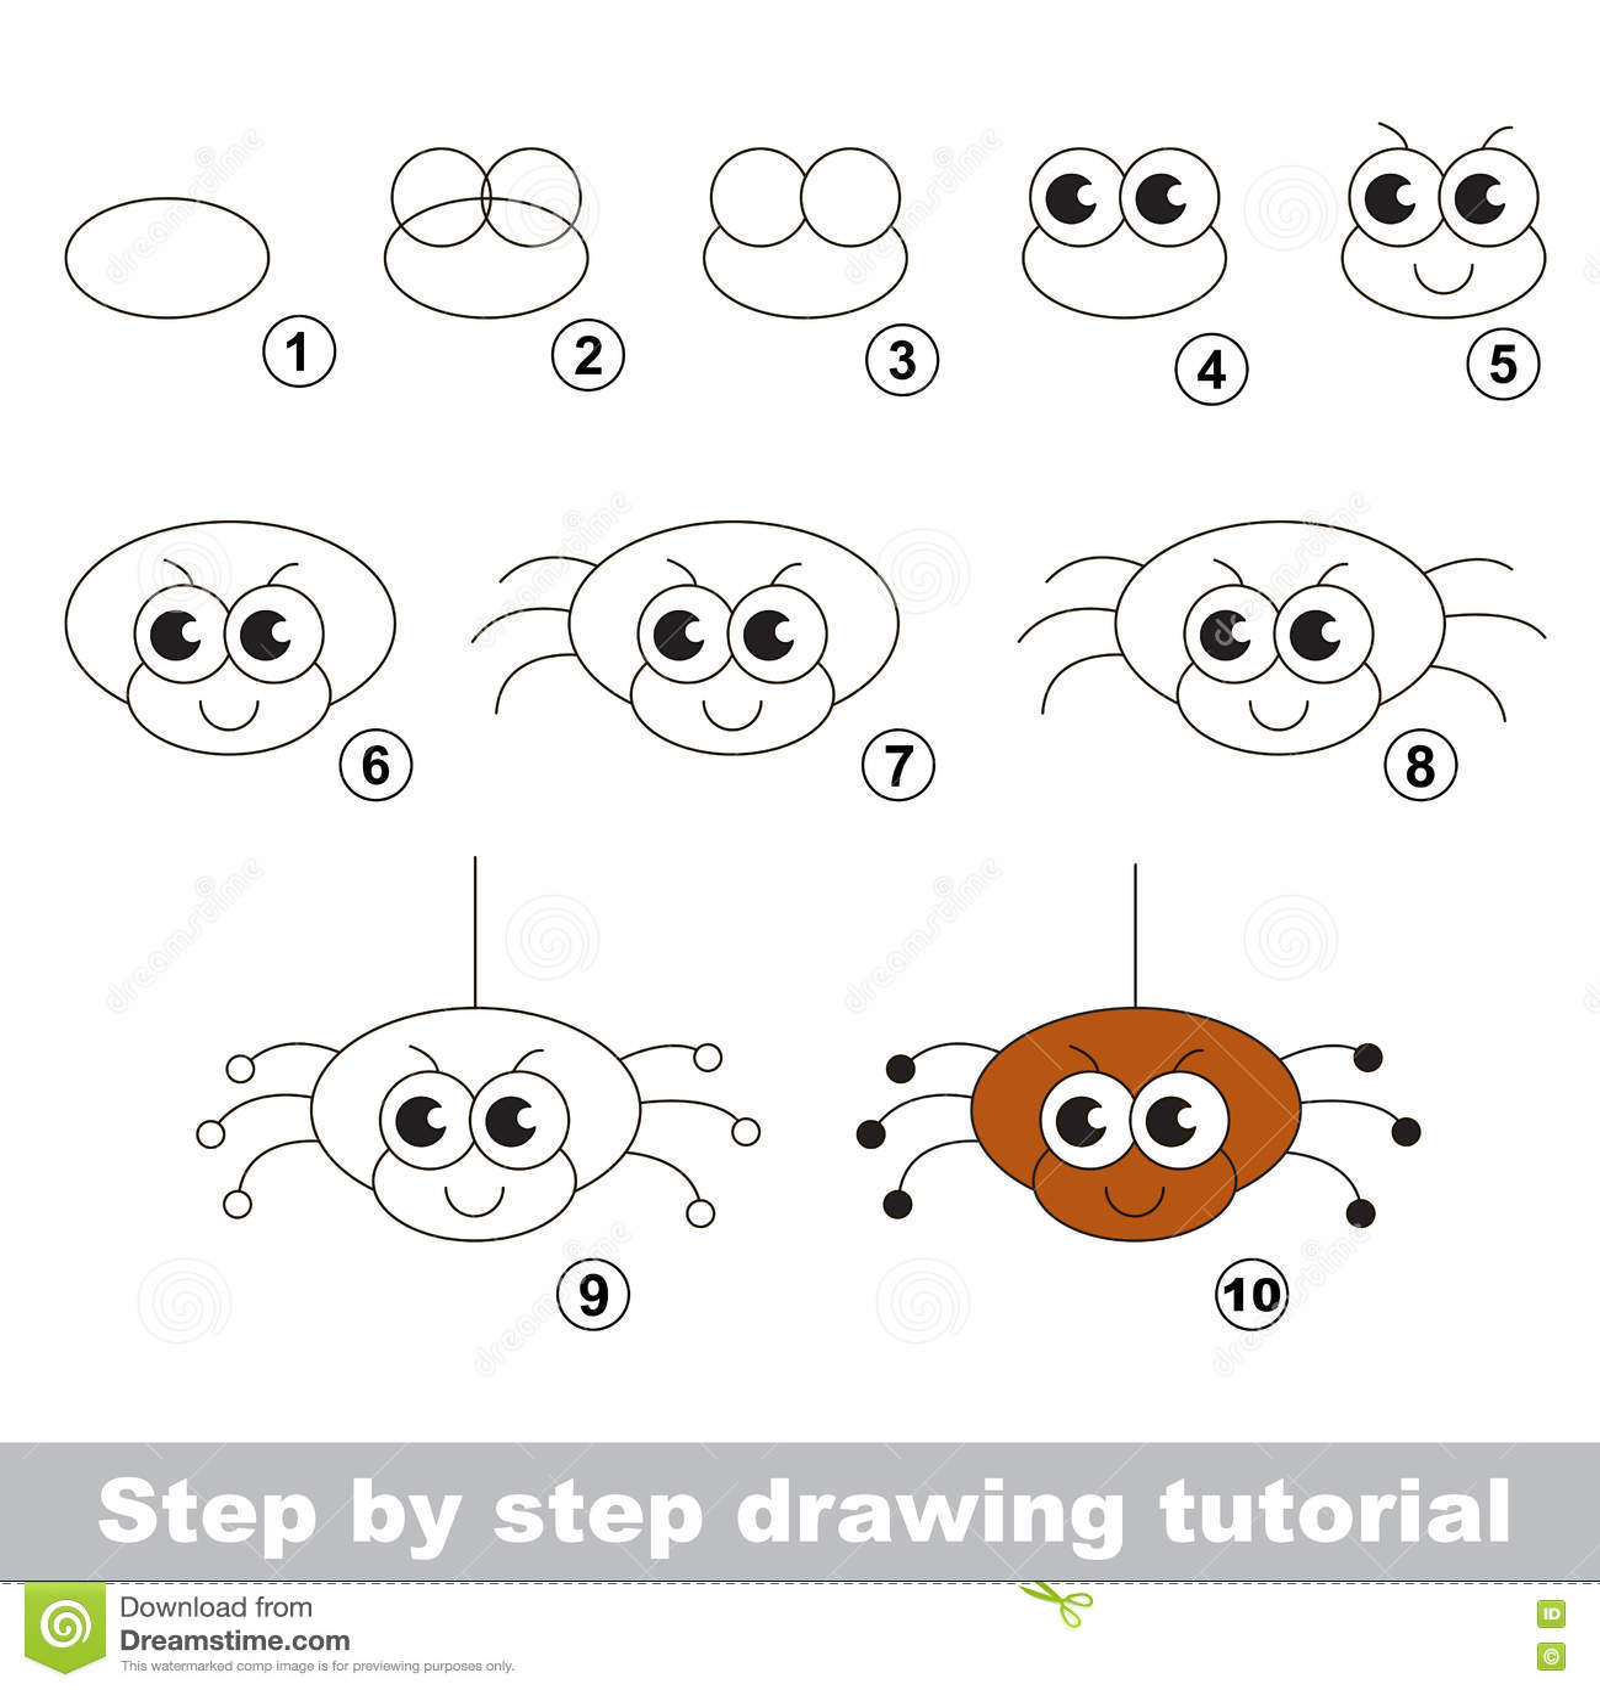 La Arana Divertida Tutorial Del Dibujo Ilustracion Del